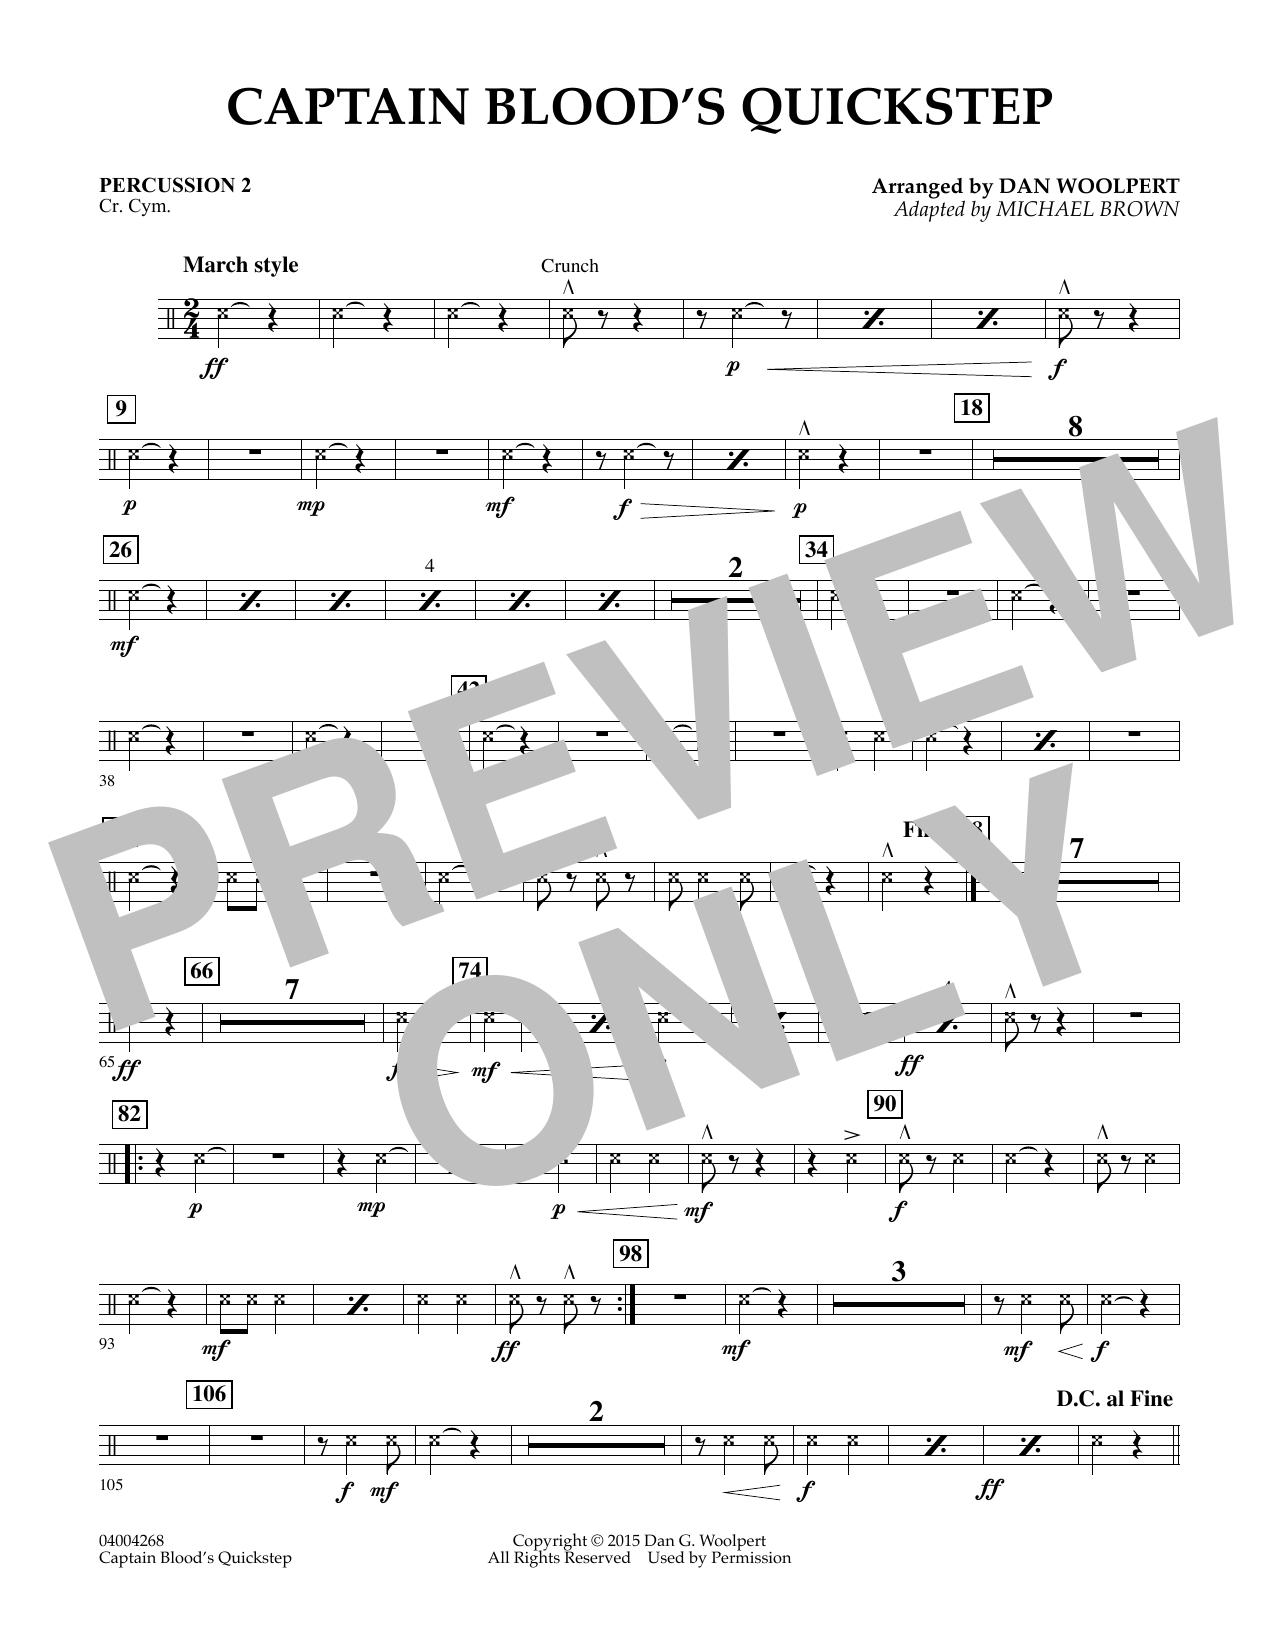 Captain Blood's Quickstep - Score & Parts by Dan Woolpert Michael Brown